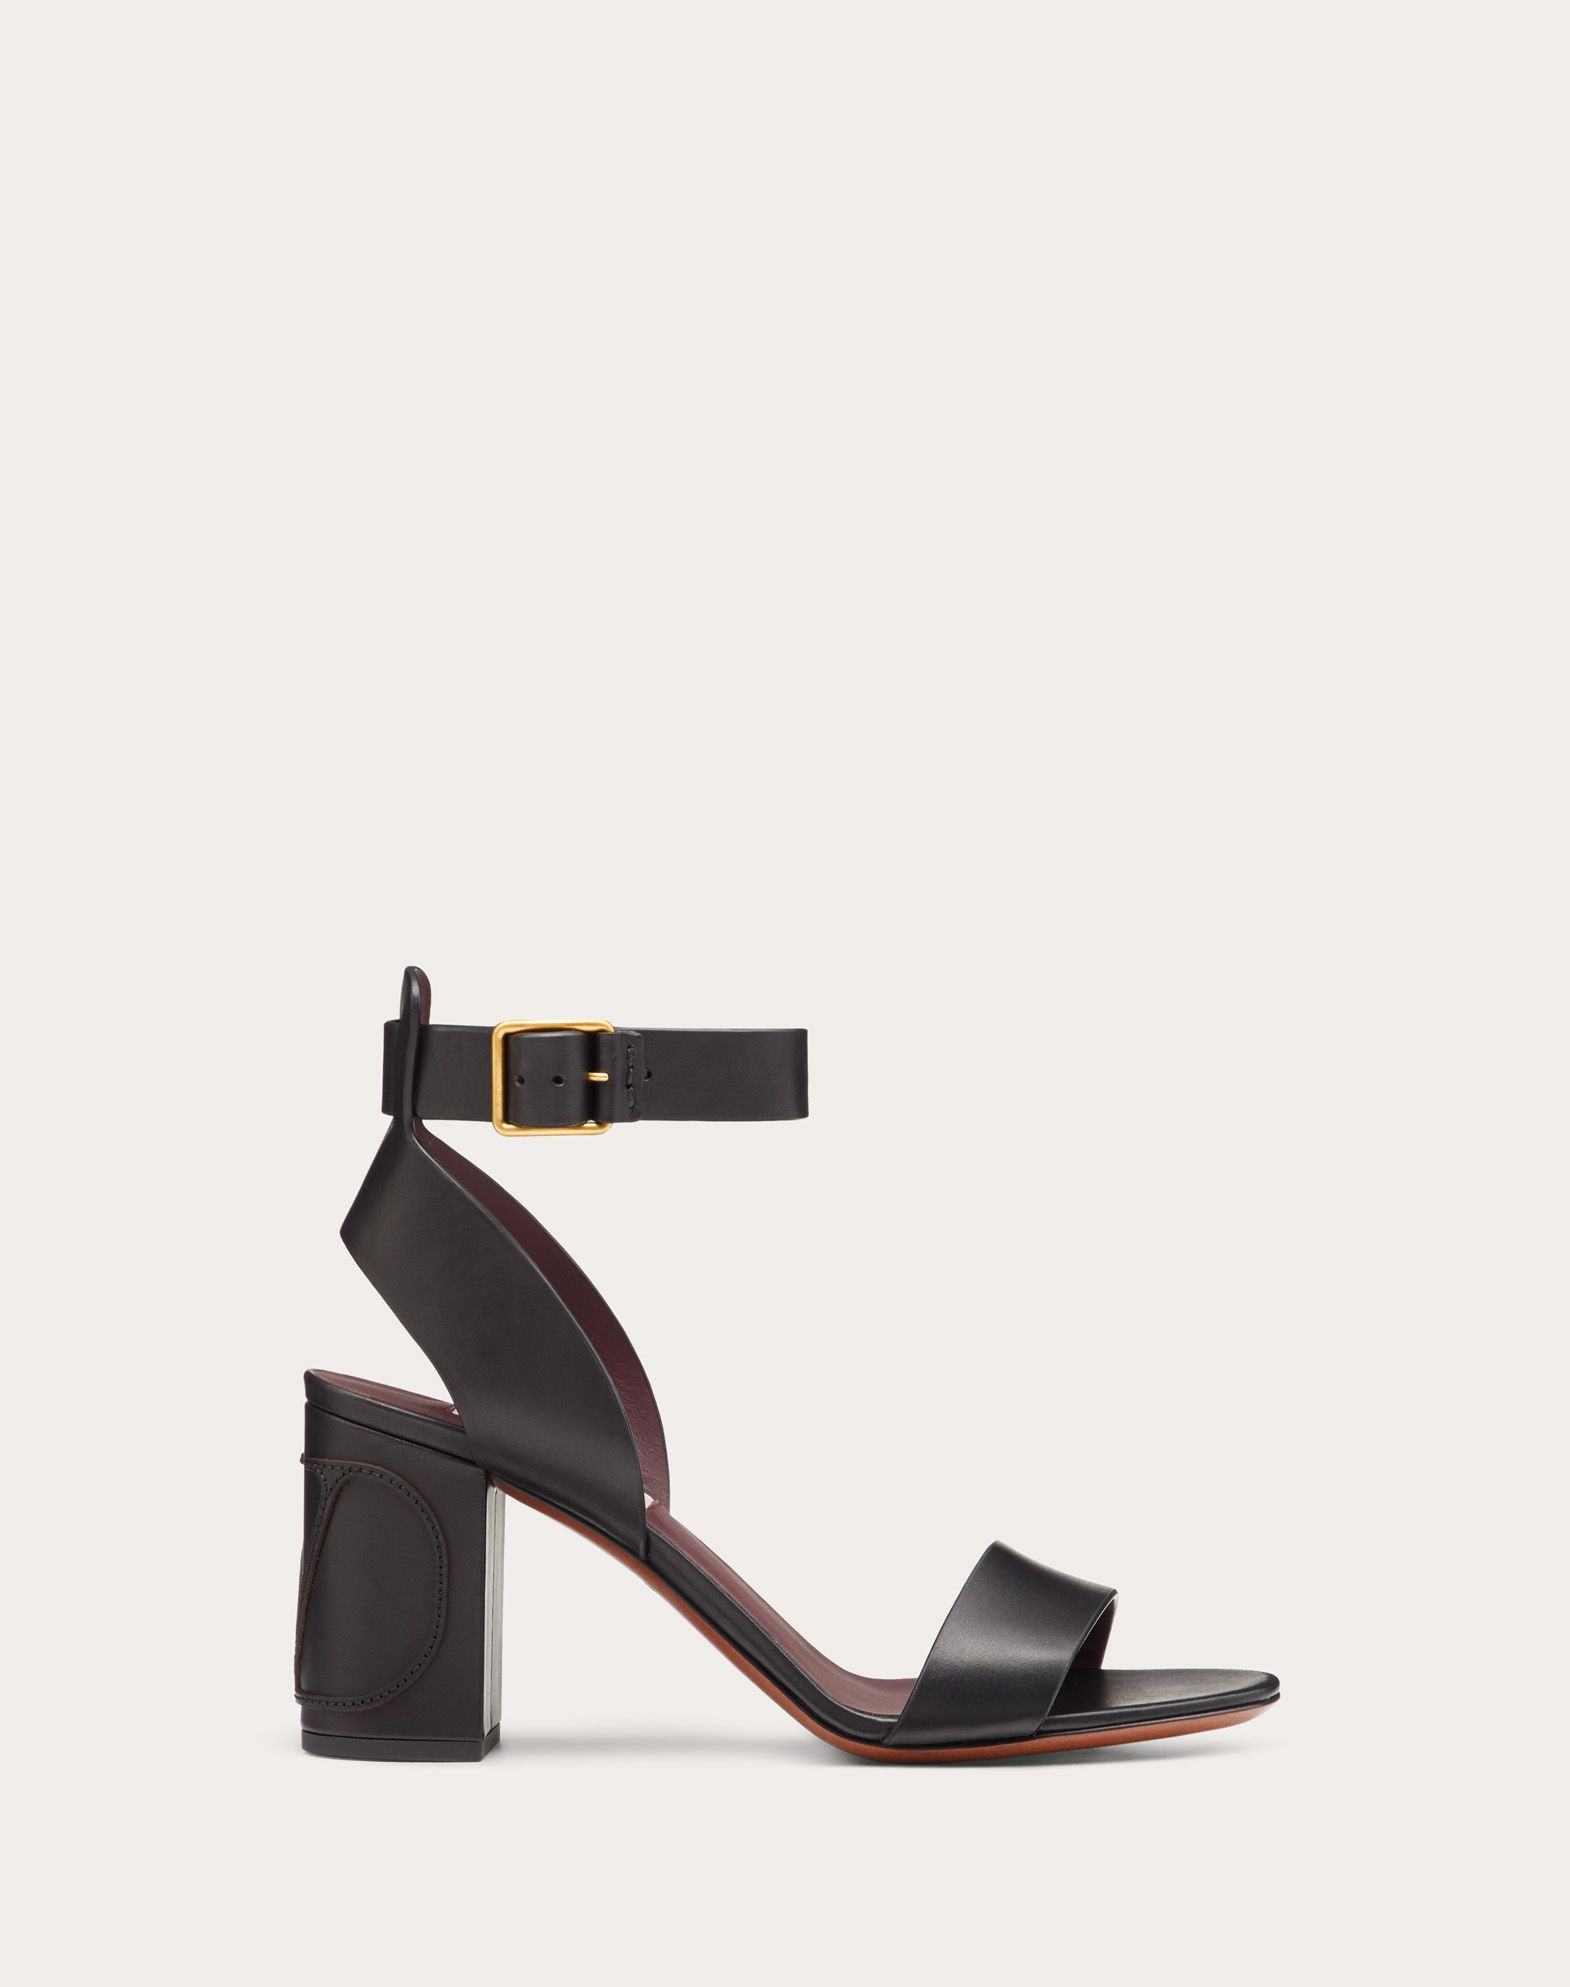 VLOGO Cowhide Sandal 80 mm